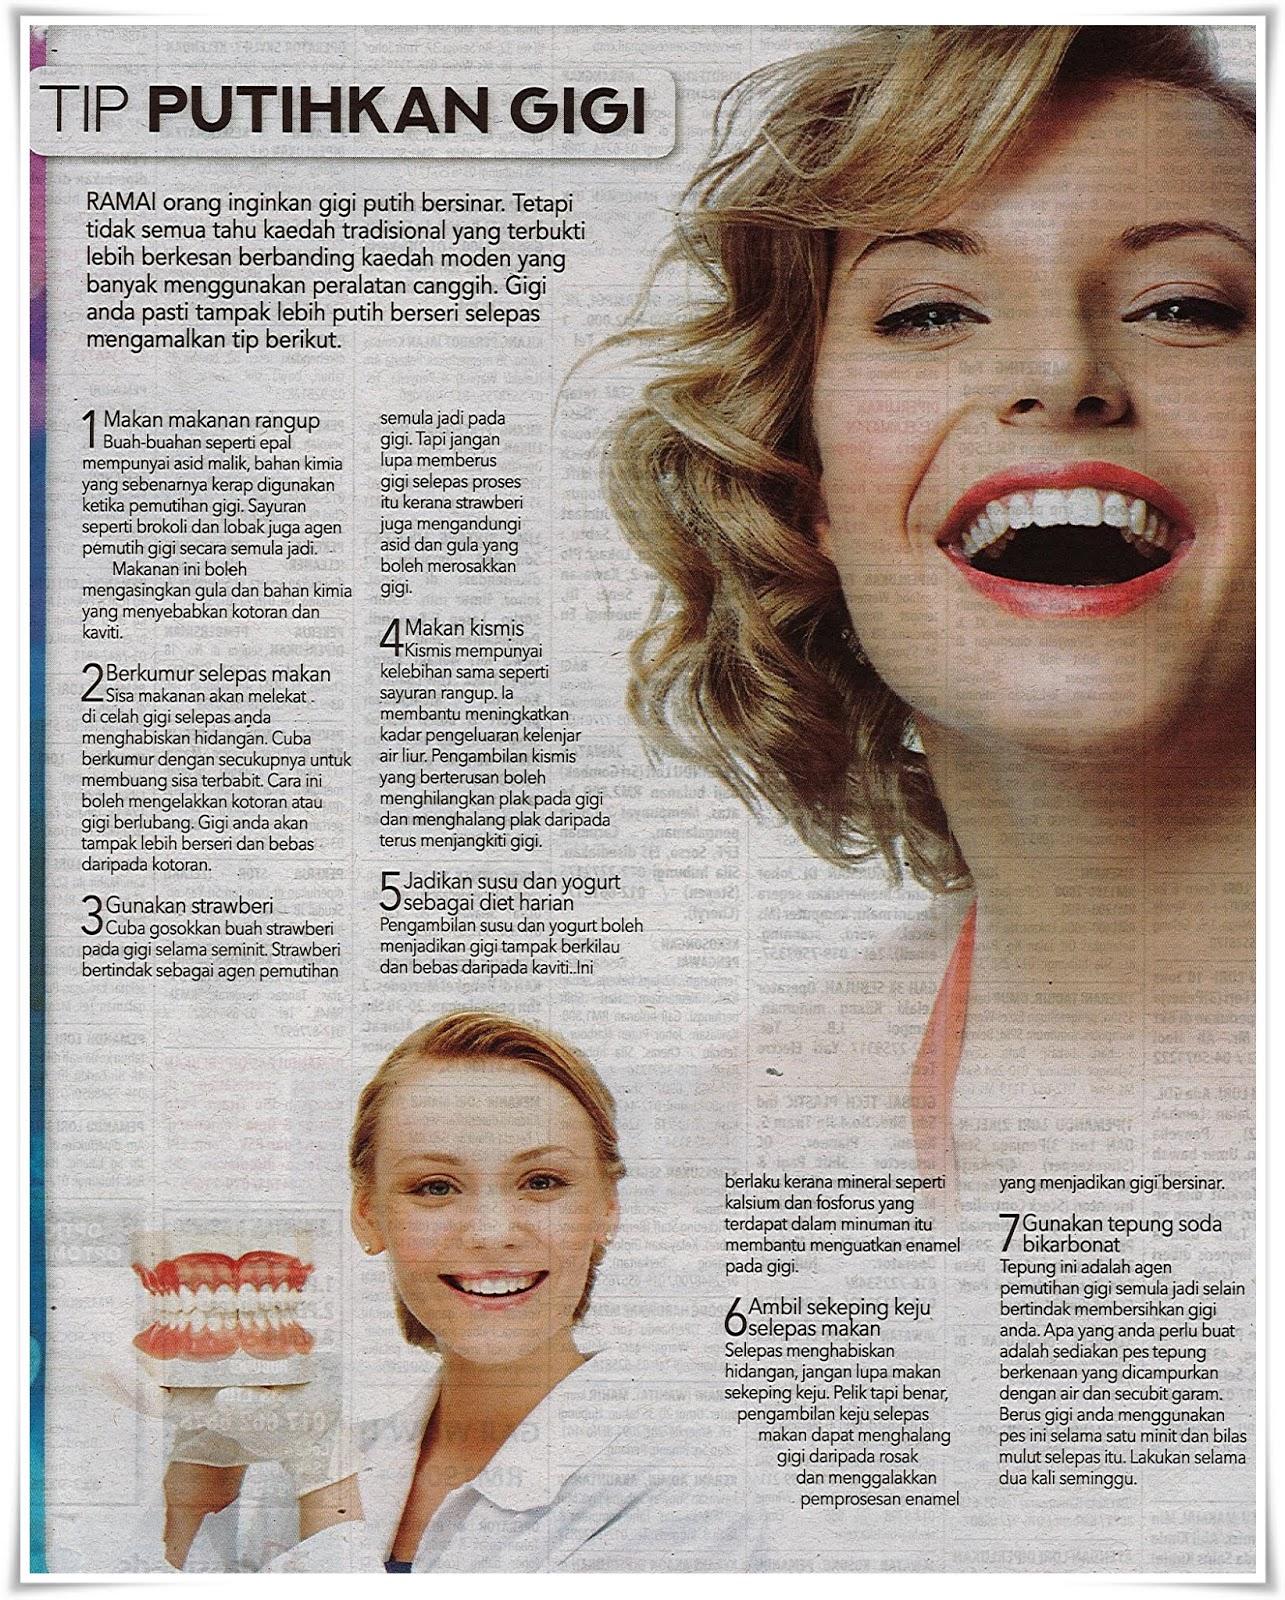 Tips putihkan gigi